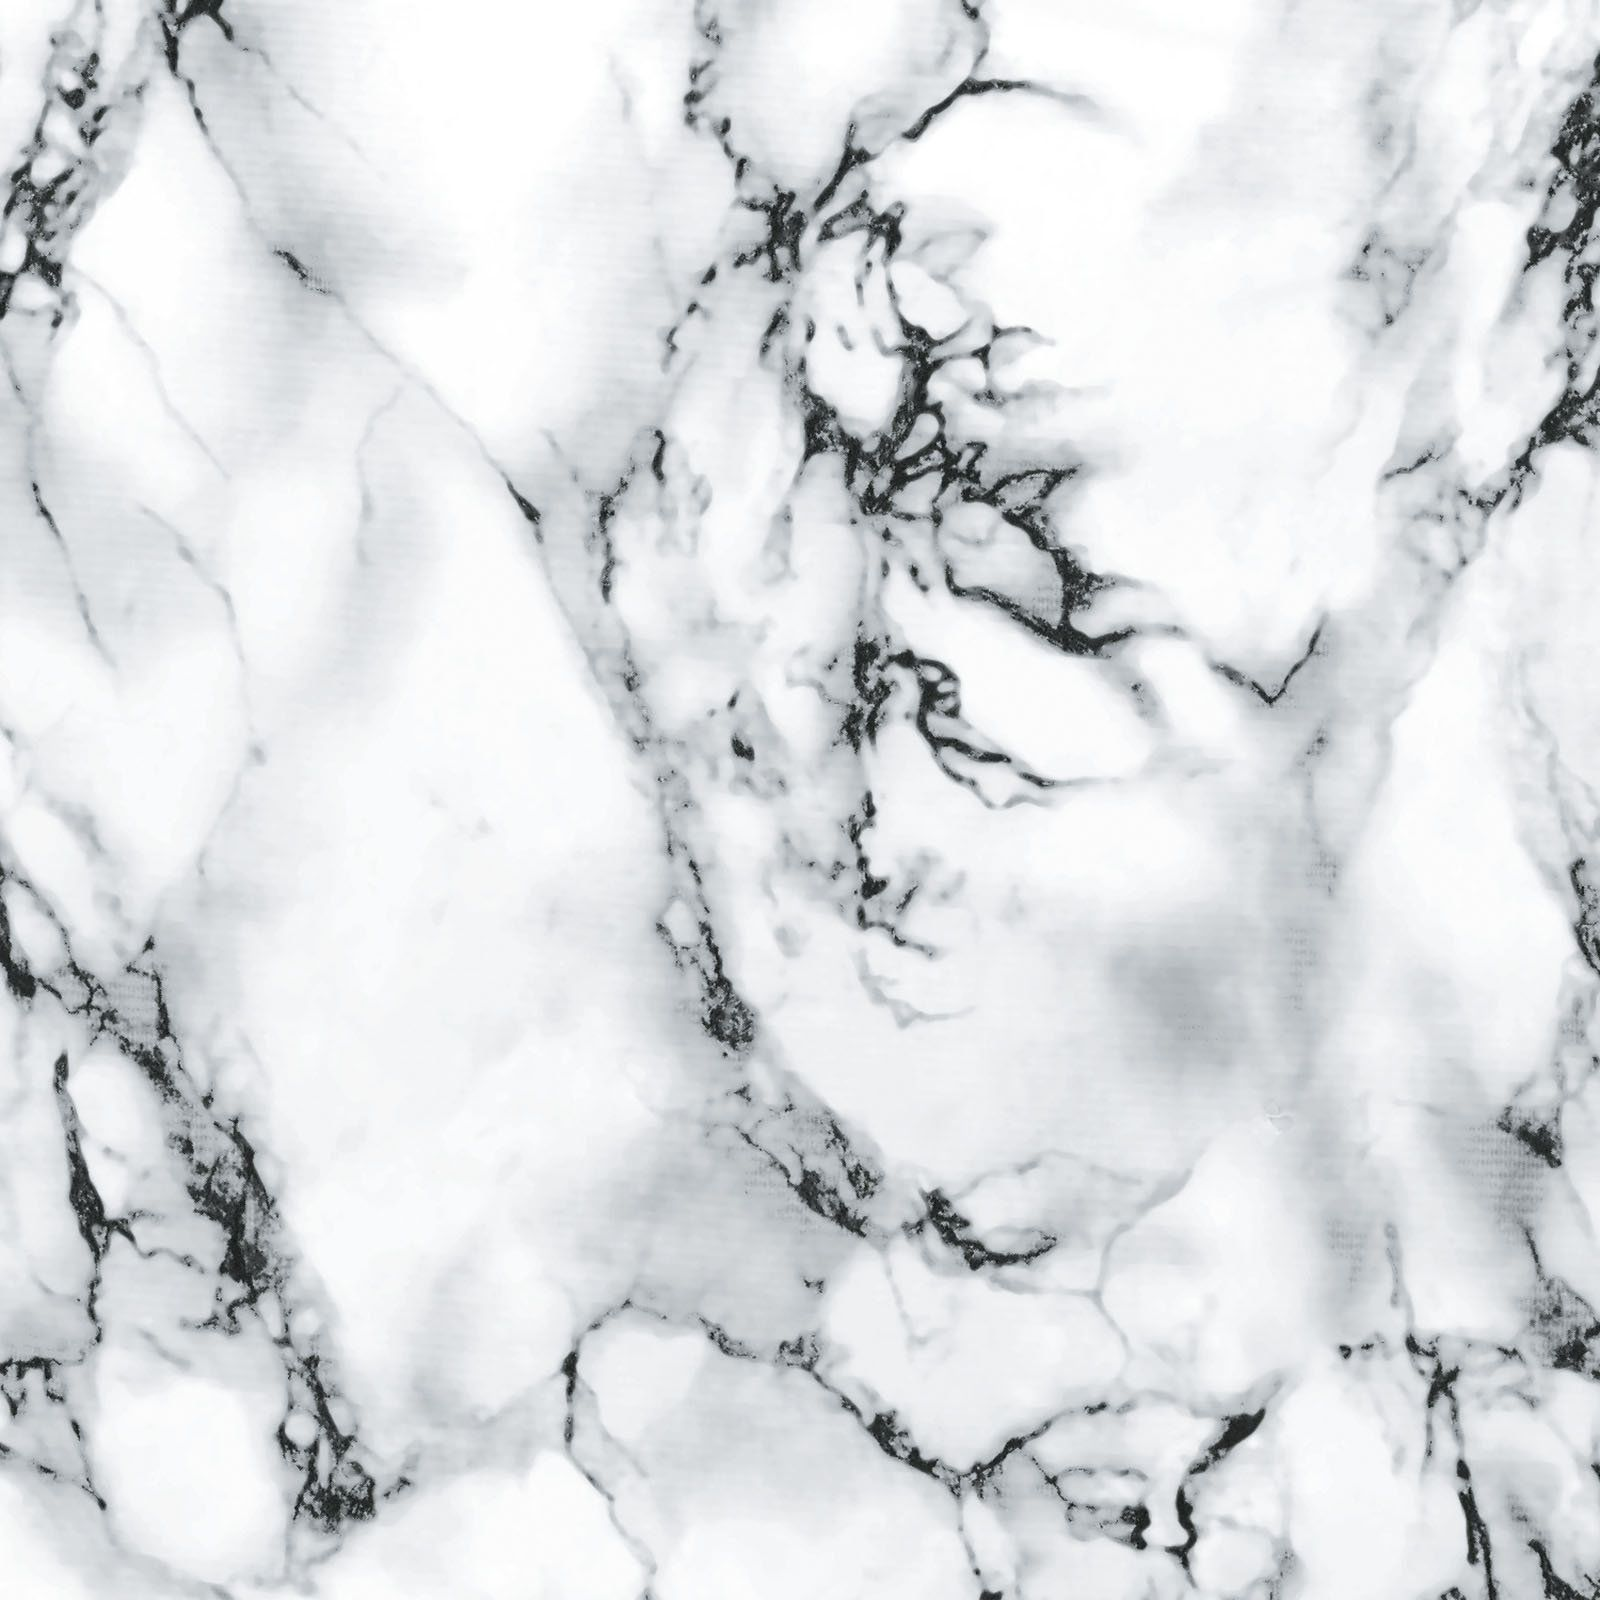 d c fix klebefolie marmor wei grau 90x210 cm alles pinterest marmor grau und bilder. Black Bedroom Furniture Sets. Home Design Ideas